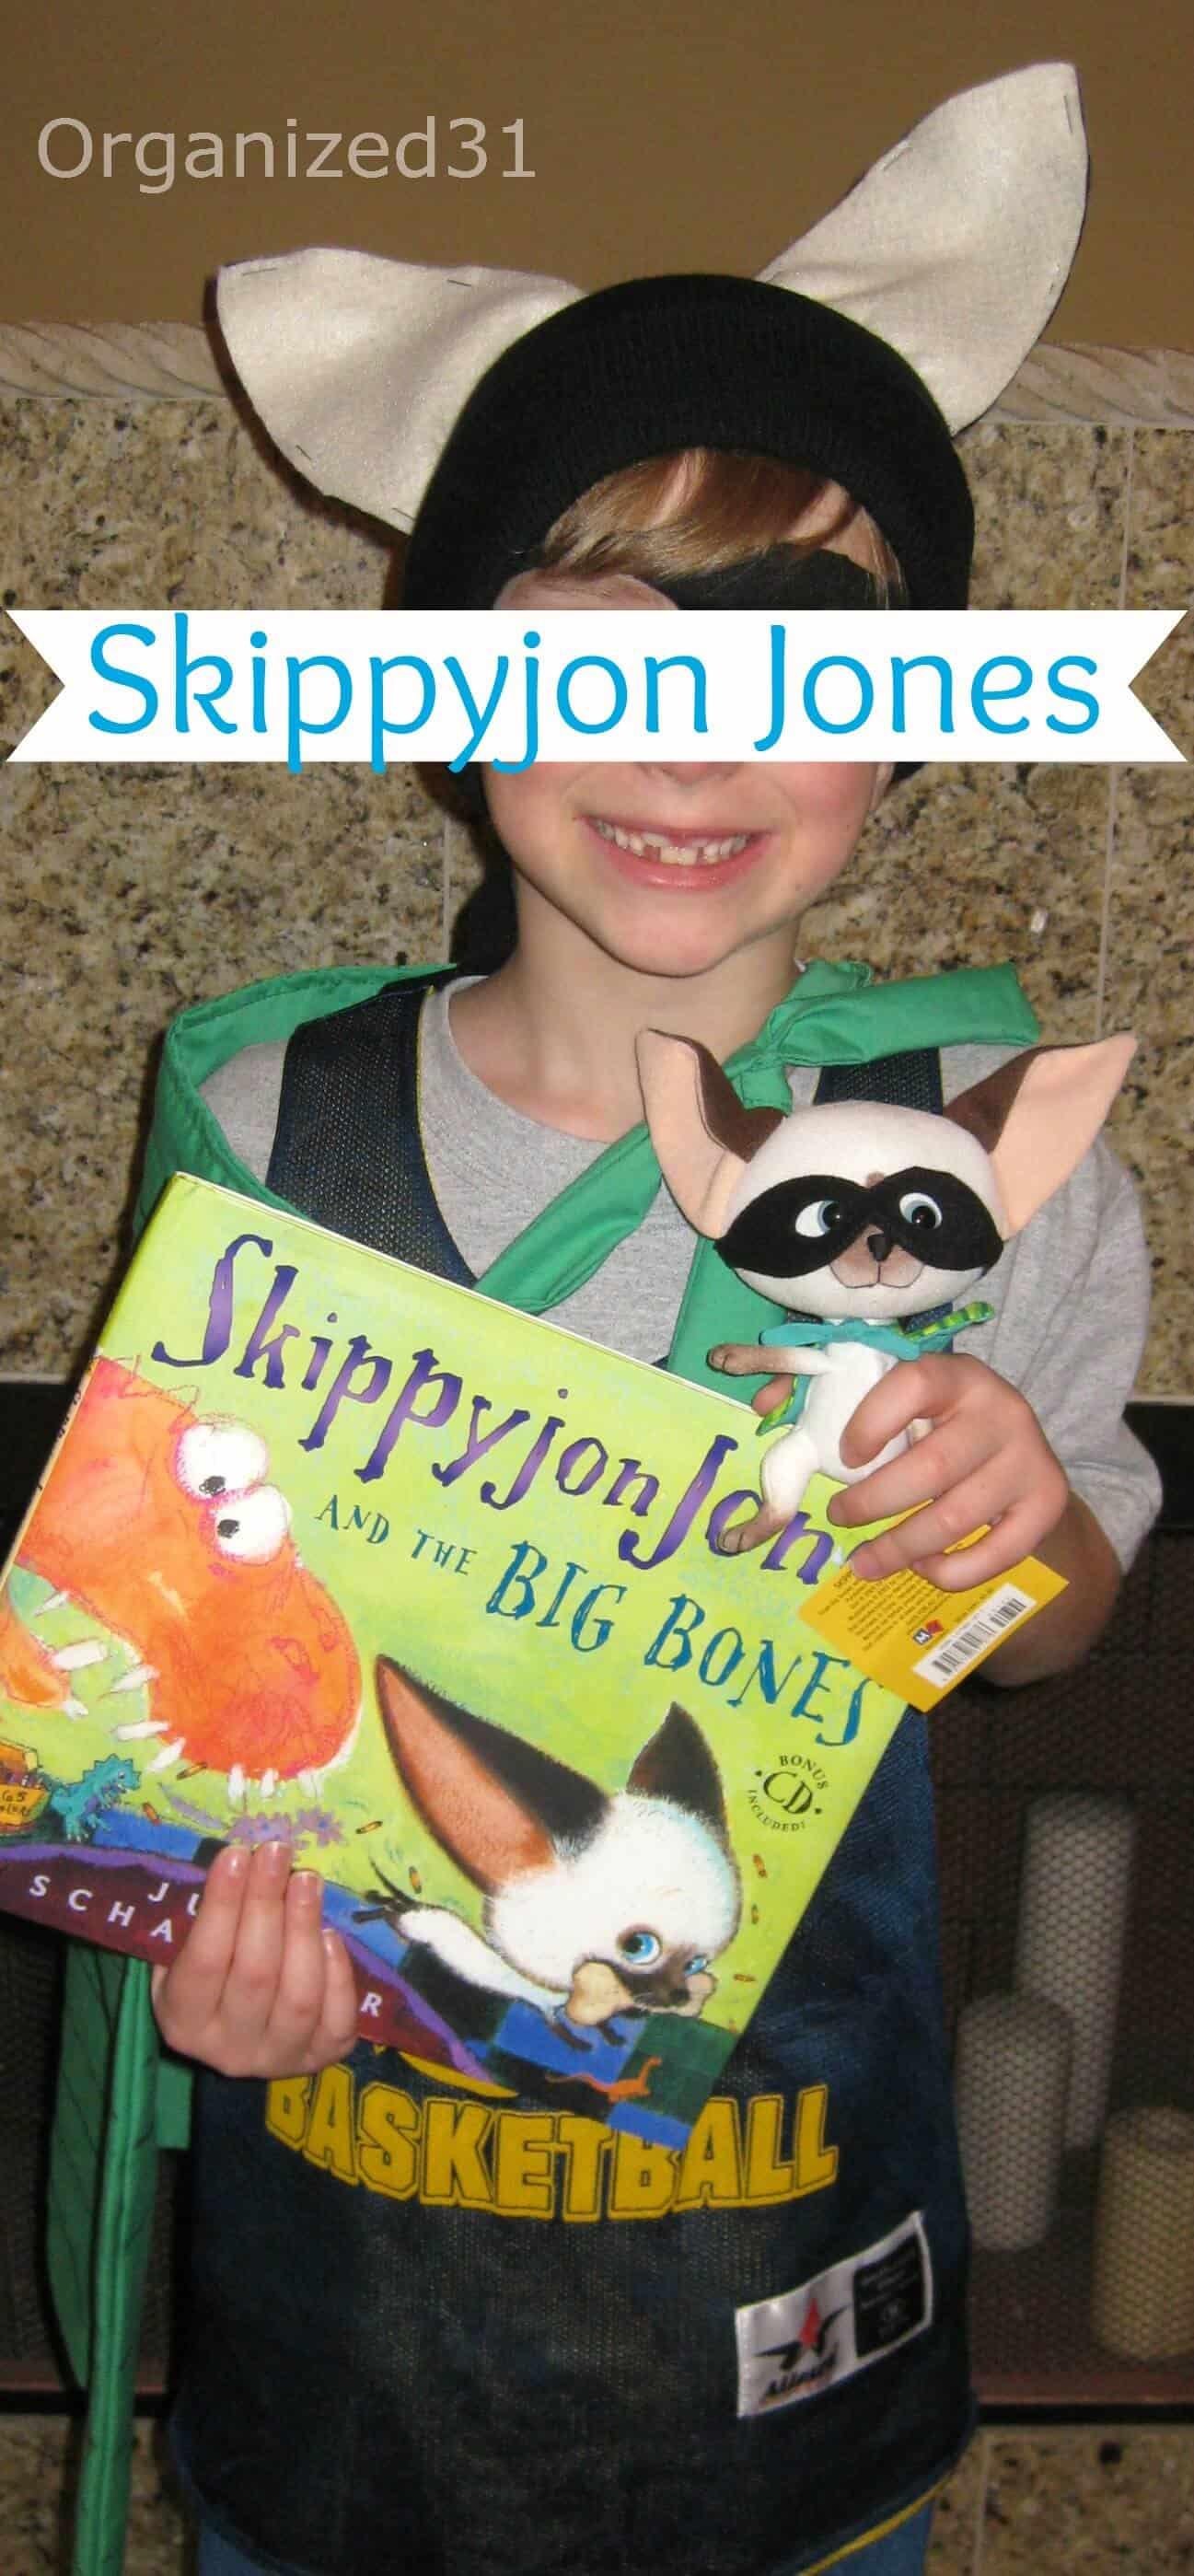 SkippyJon Jones Costume - Organized 31